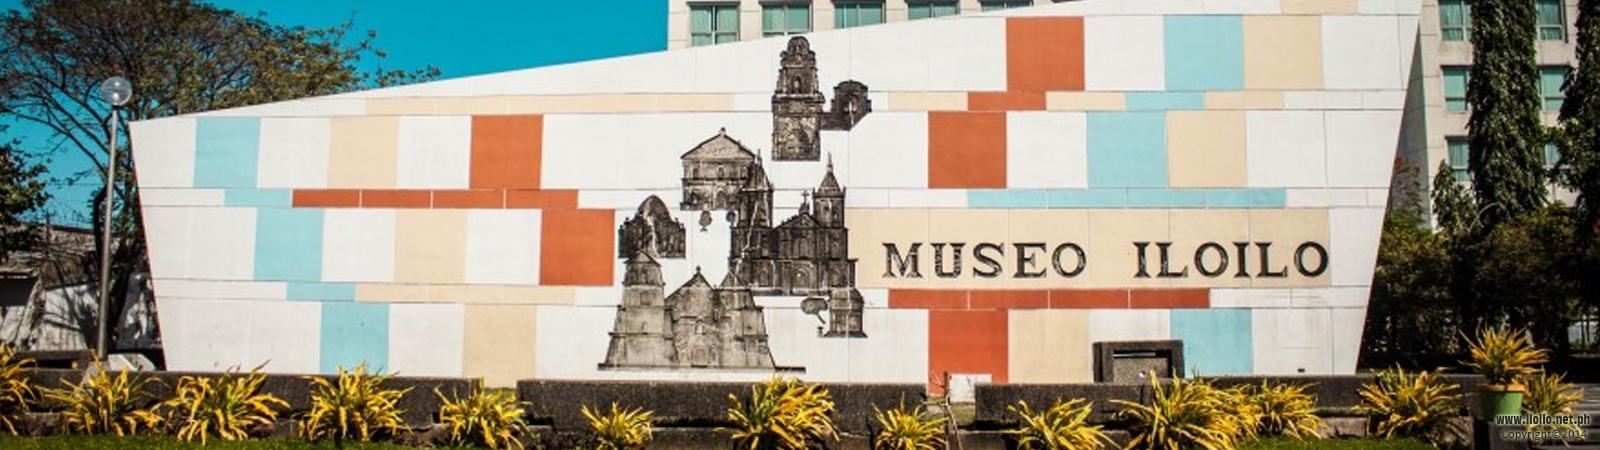 MUSEO DE ILOILO